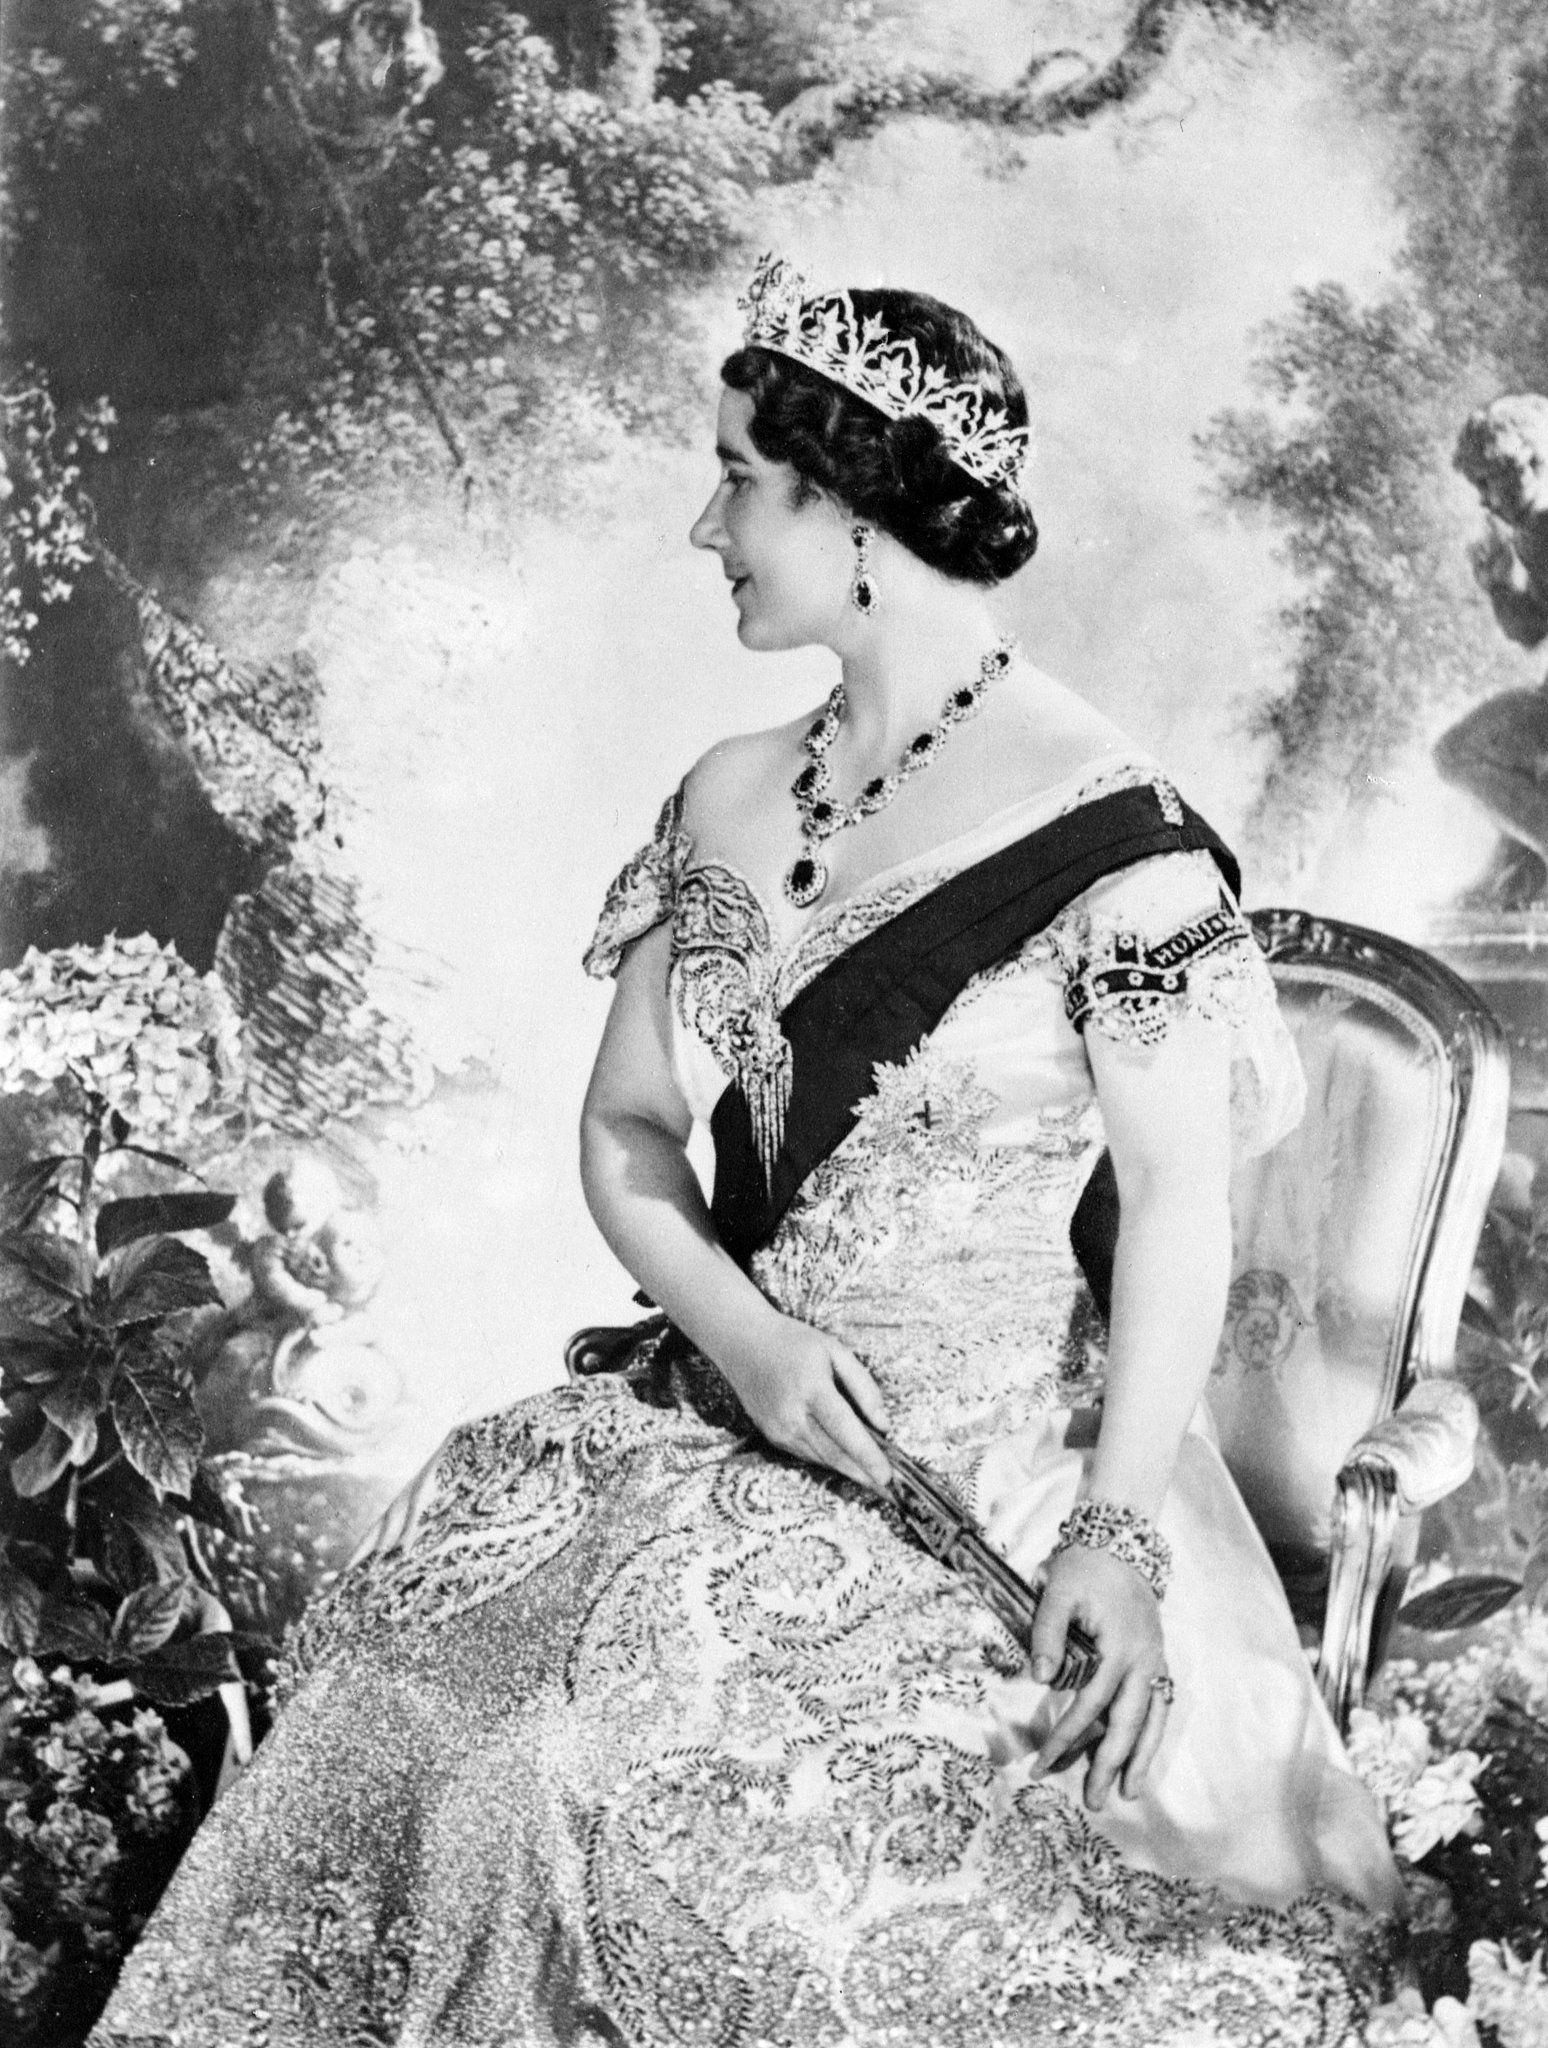 The former Duchess of York (Queen Elizabeth's mother